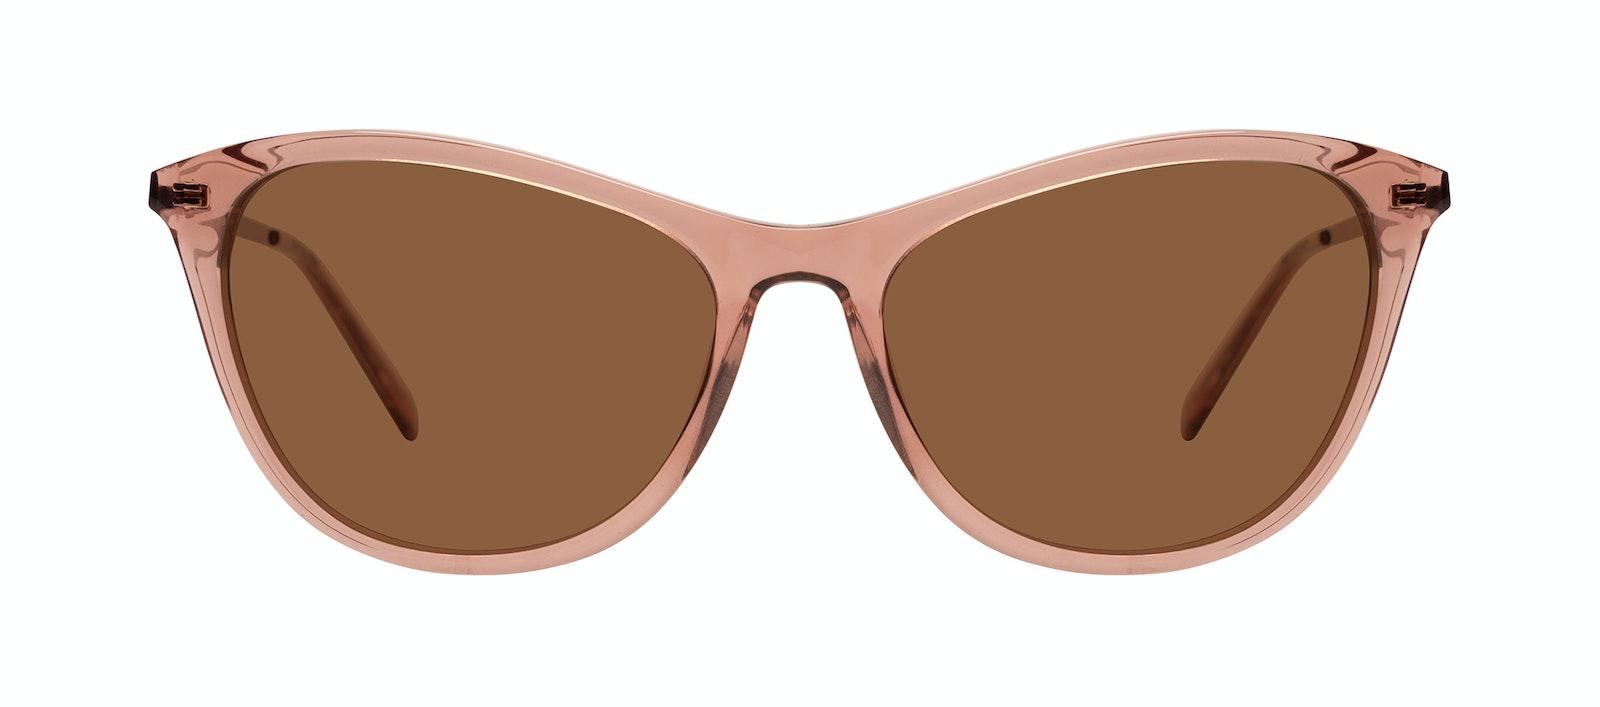 Affordable Fashion Glasses Rectangle Sunglasses Women Folk Plus Rose Front